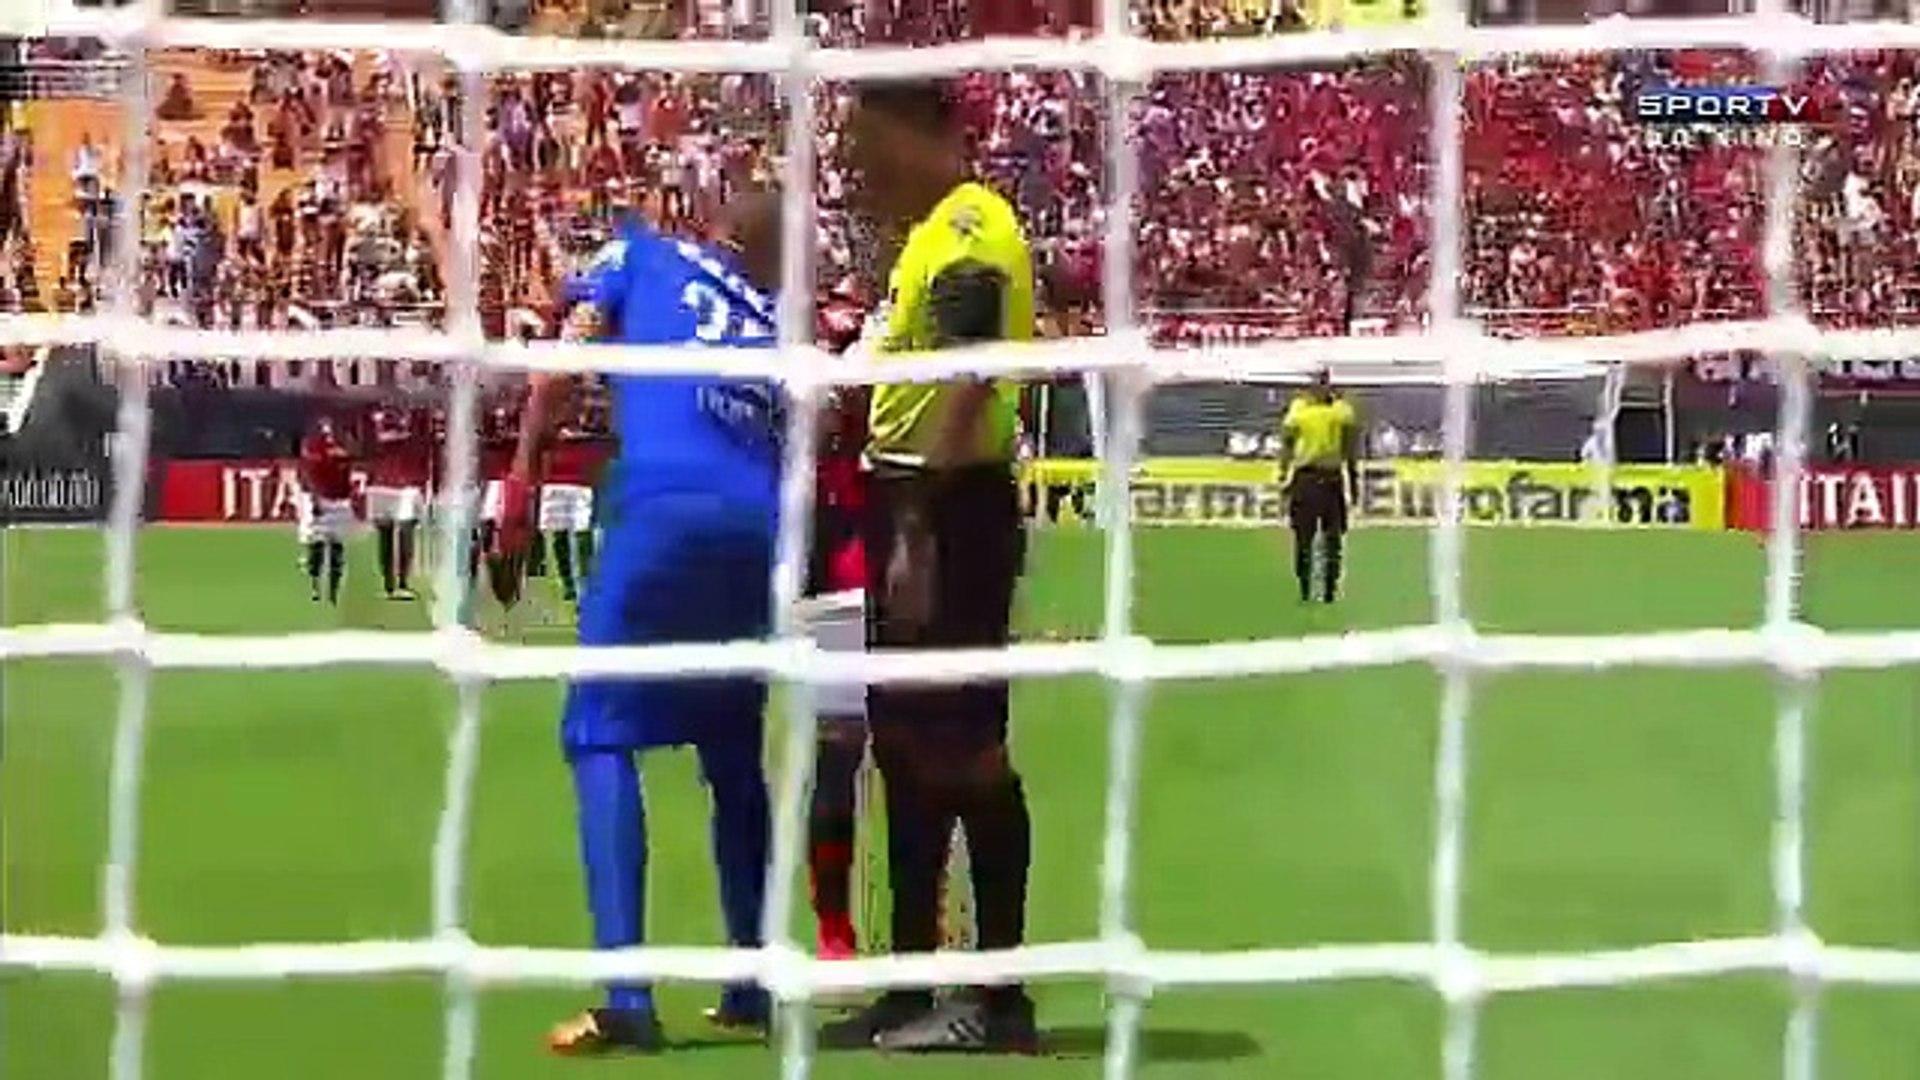 Corinthians 2 X 2 Flamengo (Penaltis 3-4) Final da Copa SP de Futebol Juniores 2016